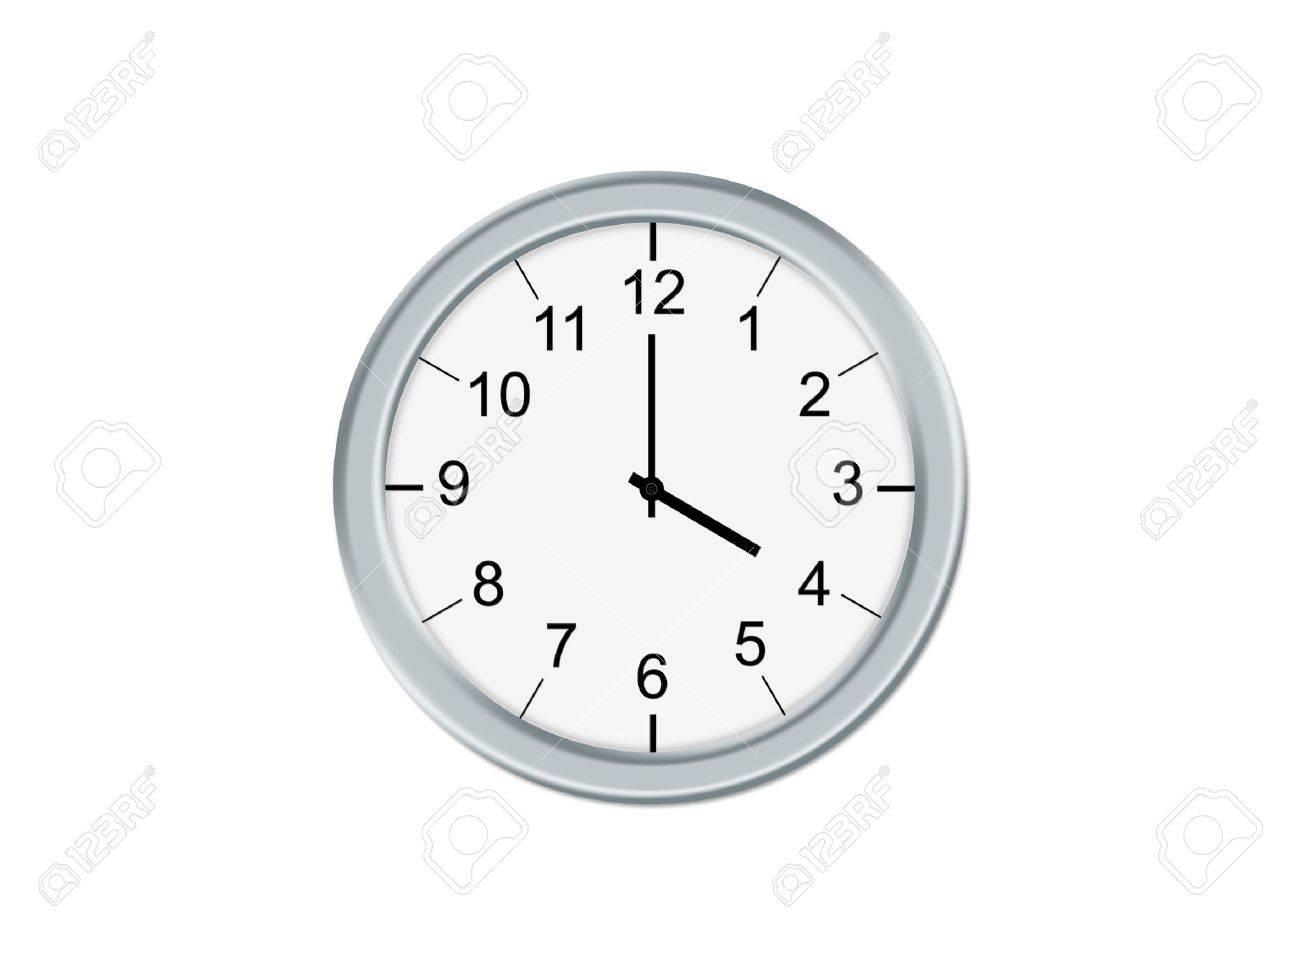 Analog clock isolated on a white background Stock Photo - 2103067